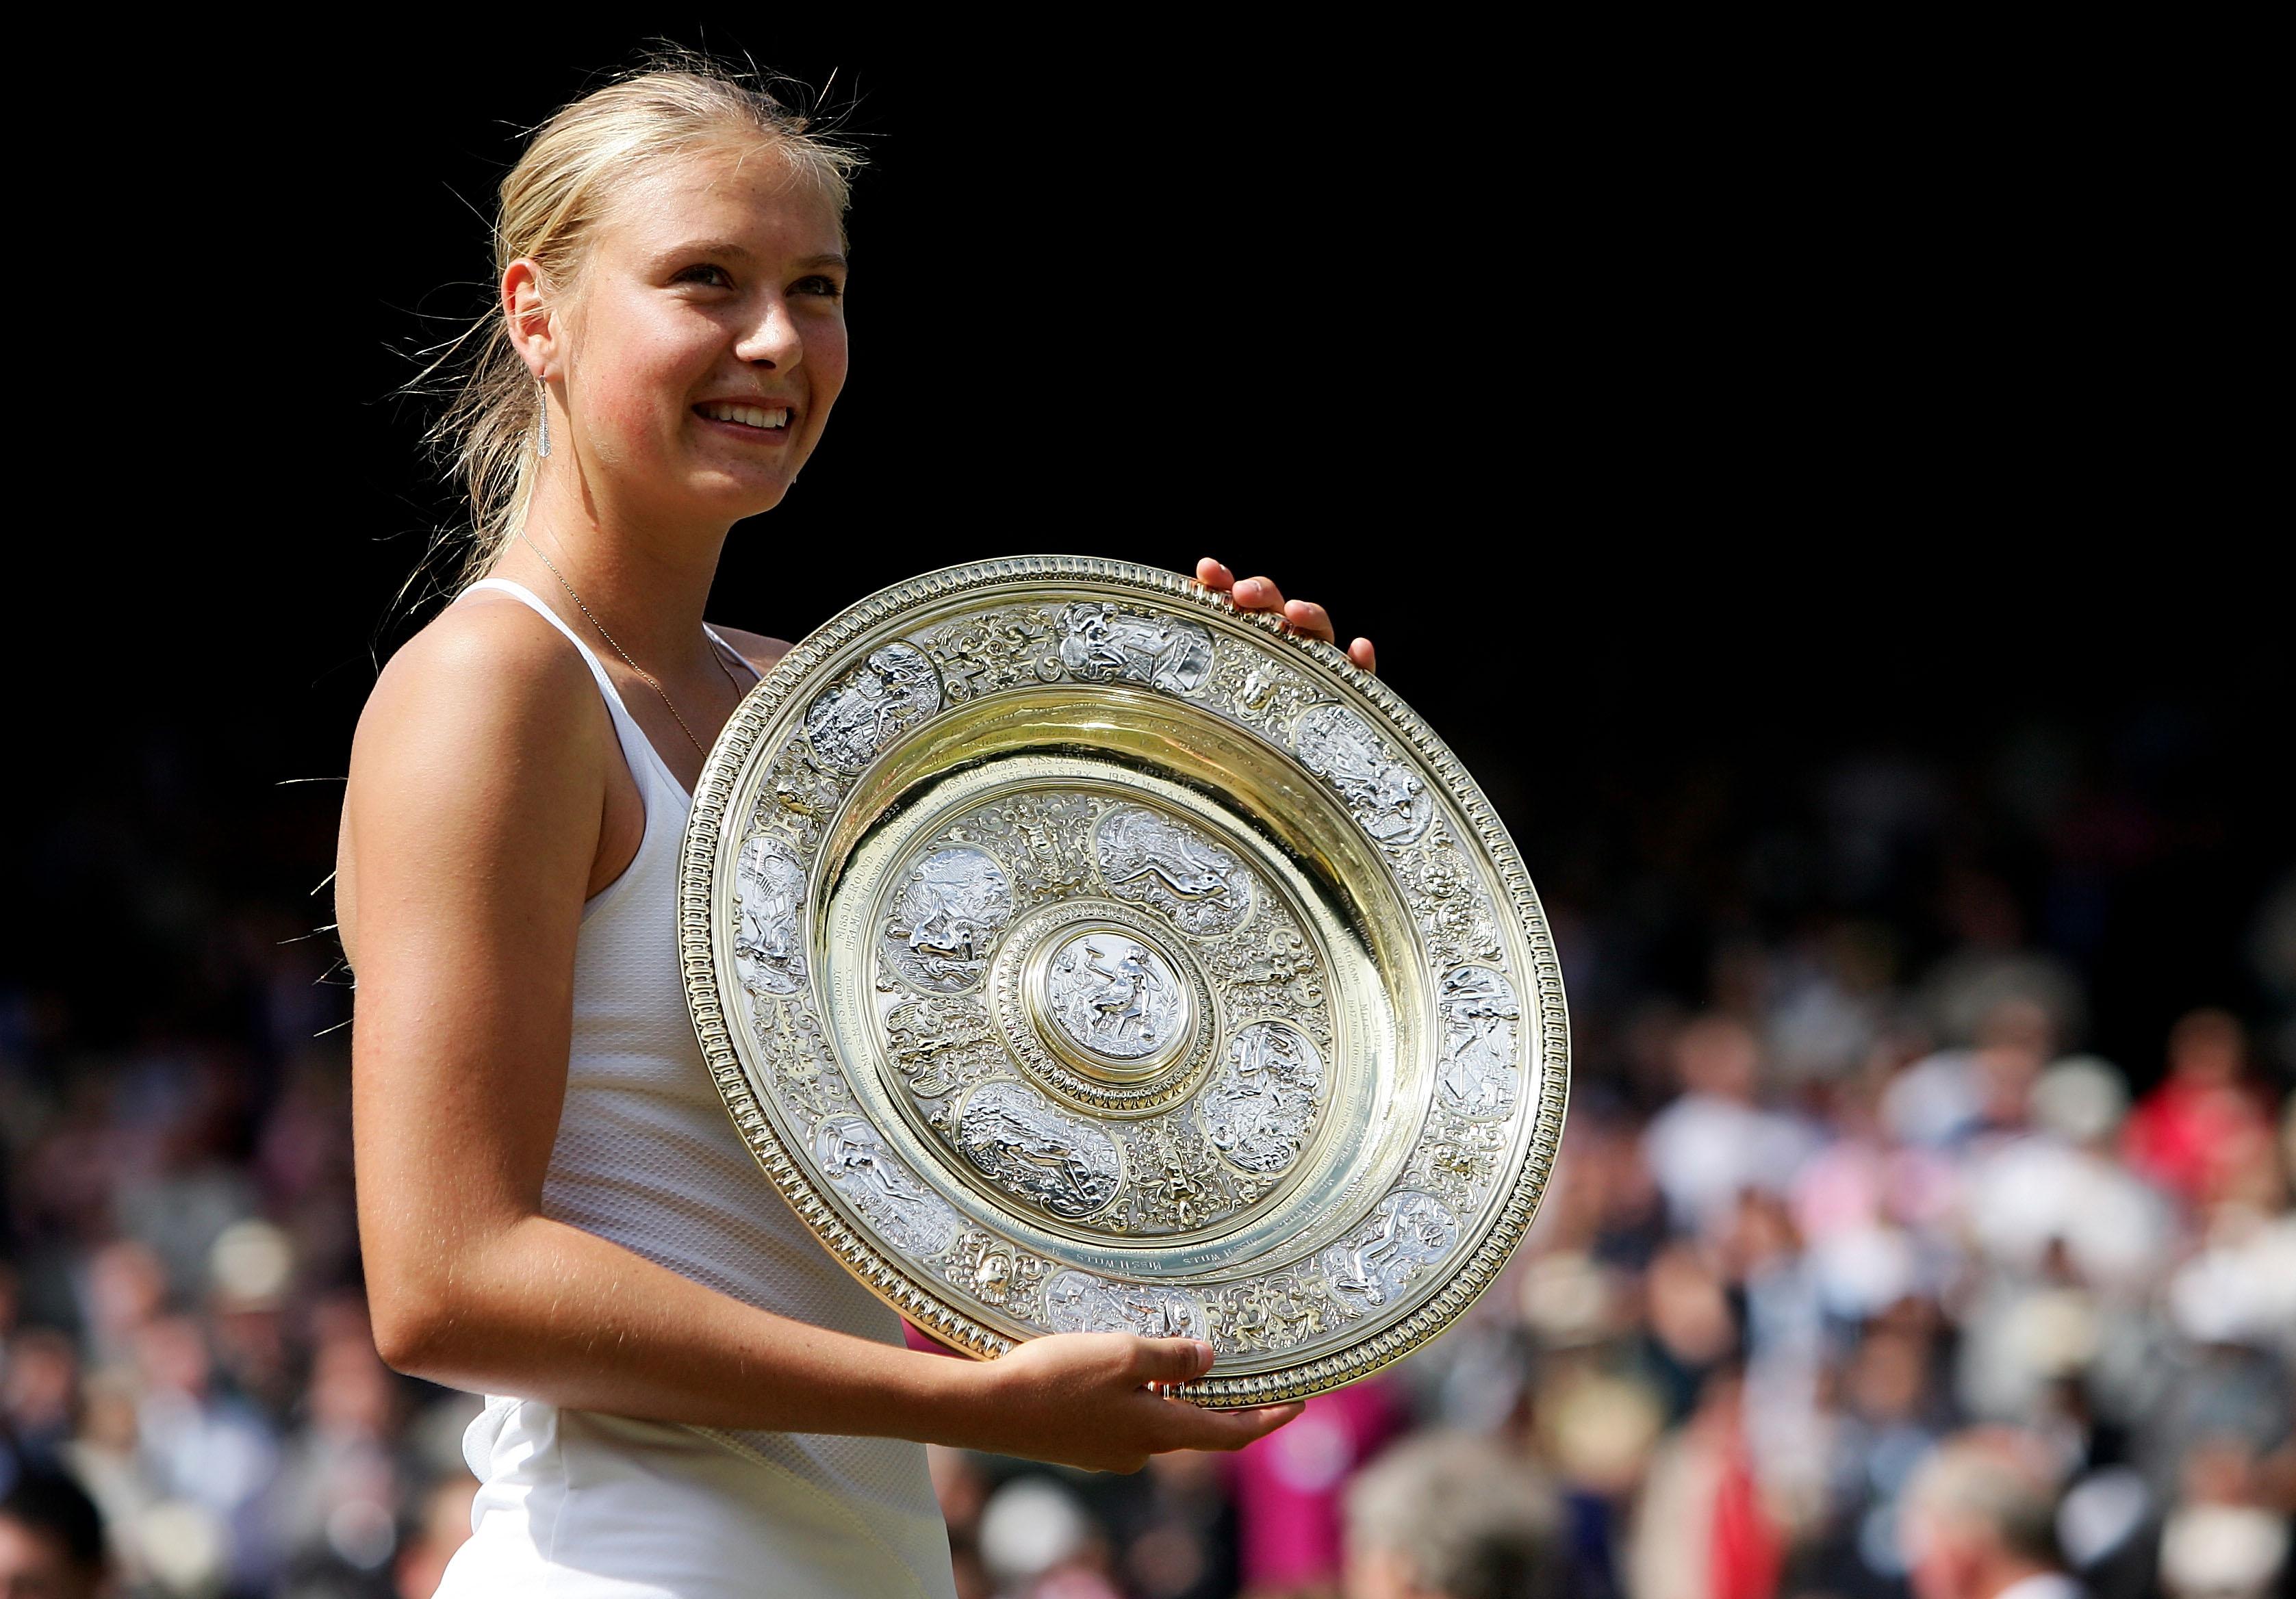 Maria Sharapova, after winning Wimbledon in 2004.